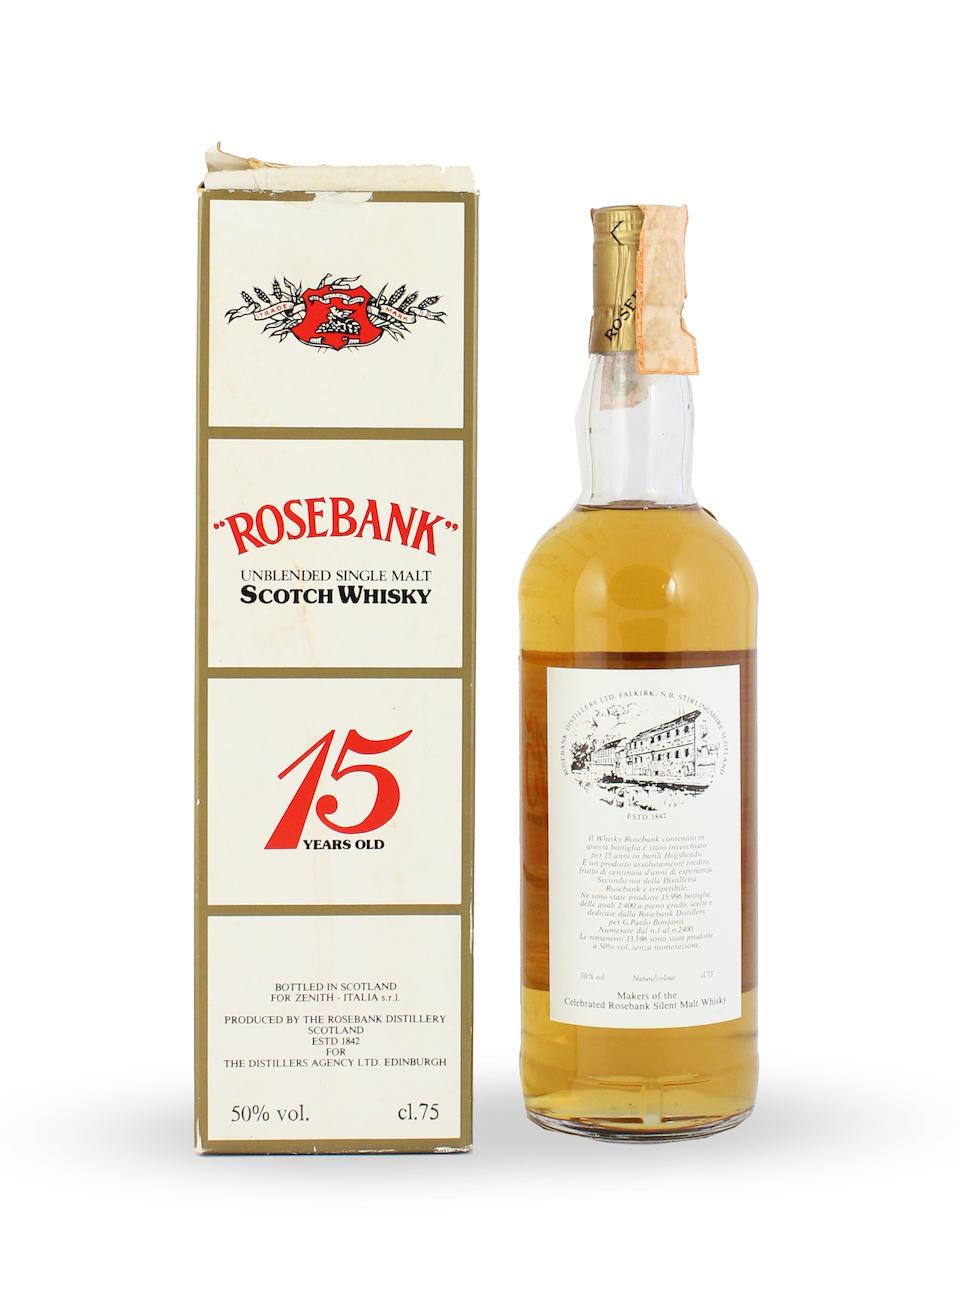 Rosebank-15 year old